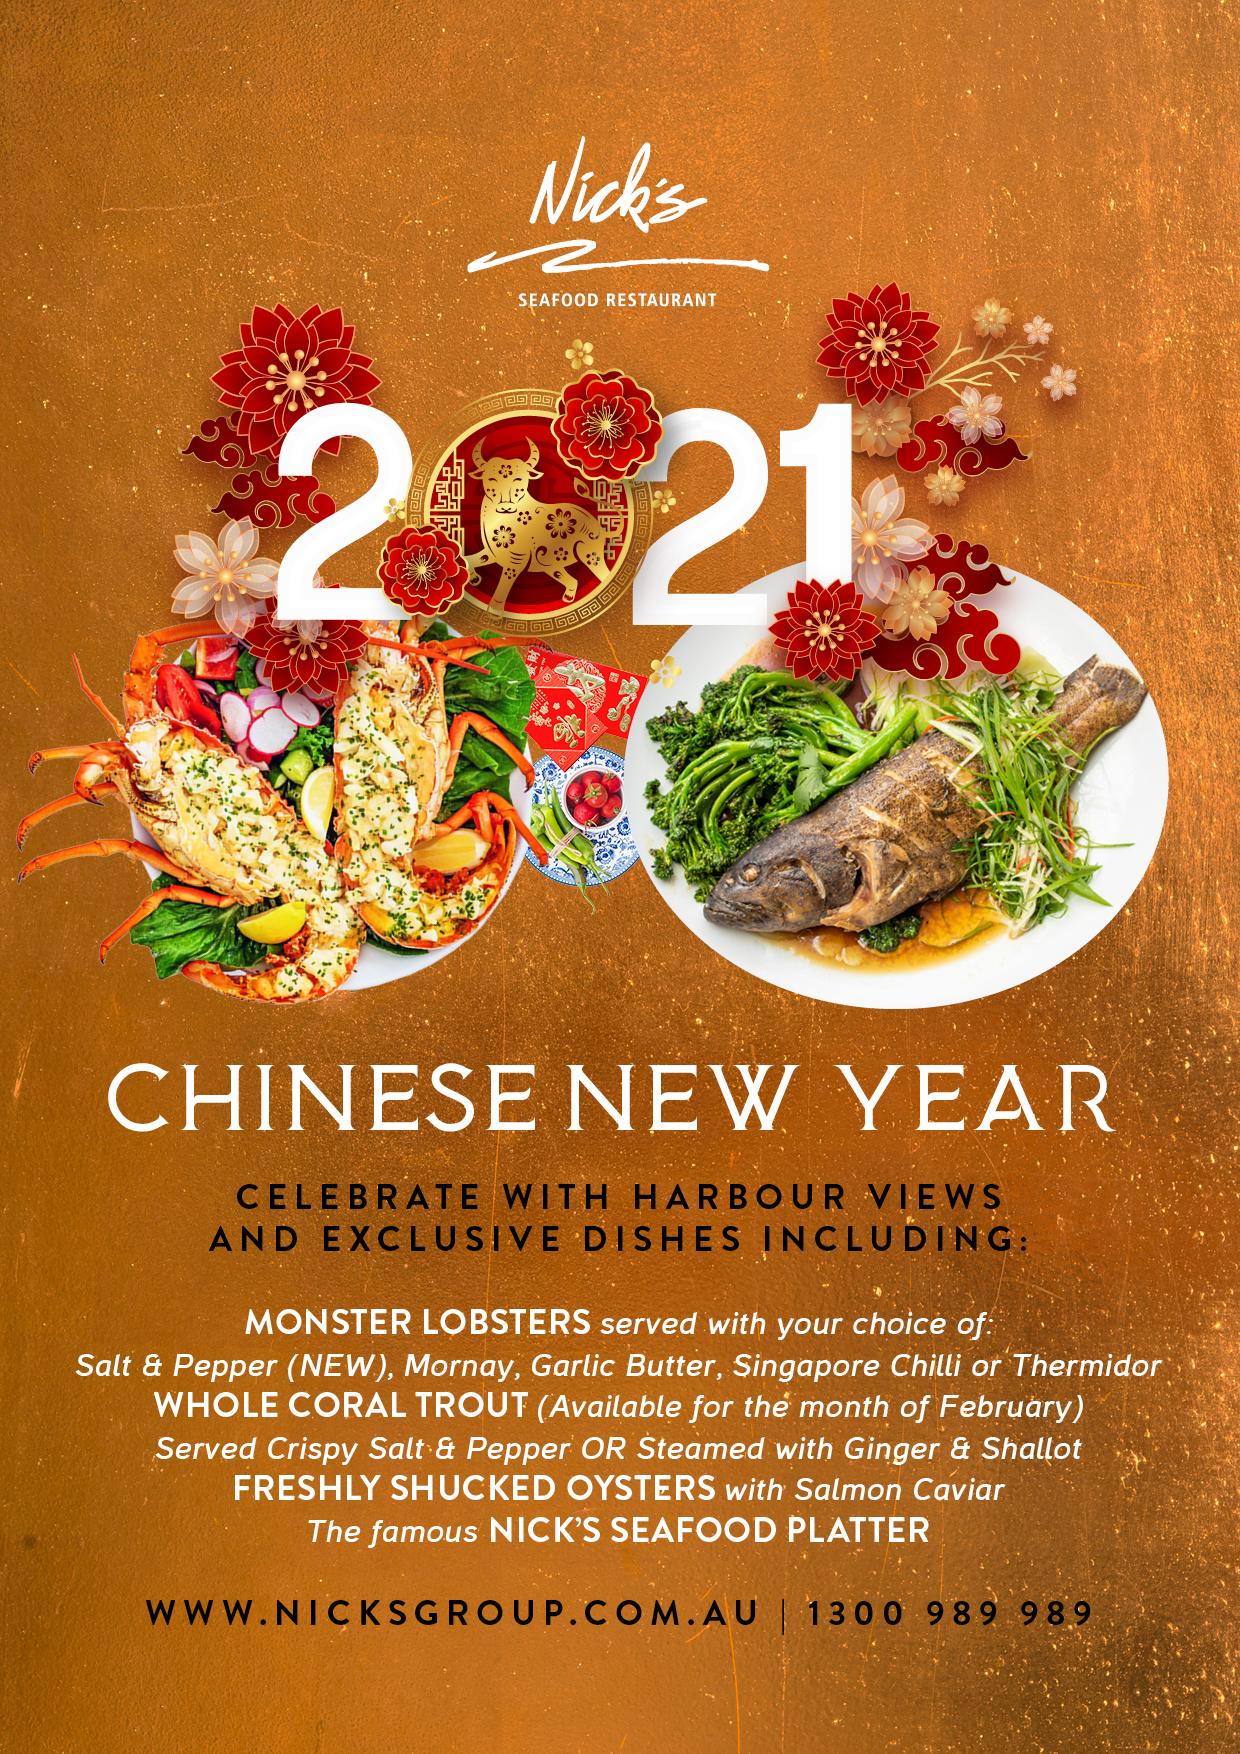 Nicks Seafood Restaurant Chinese New Year